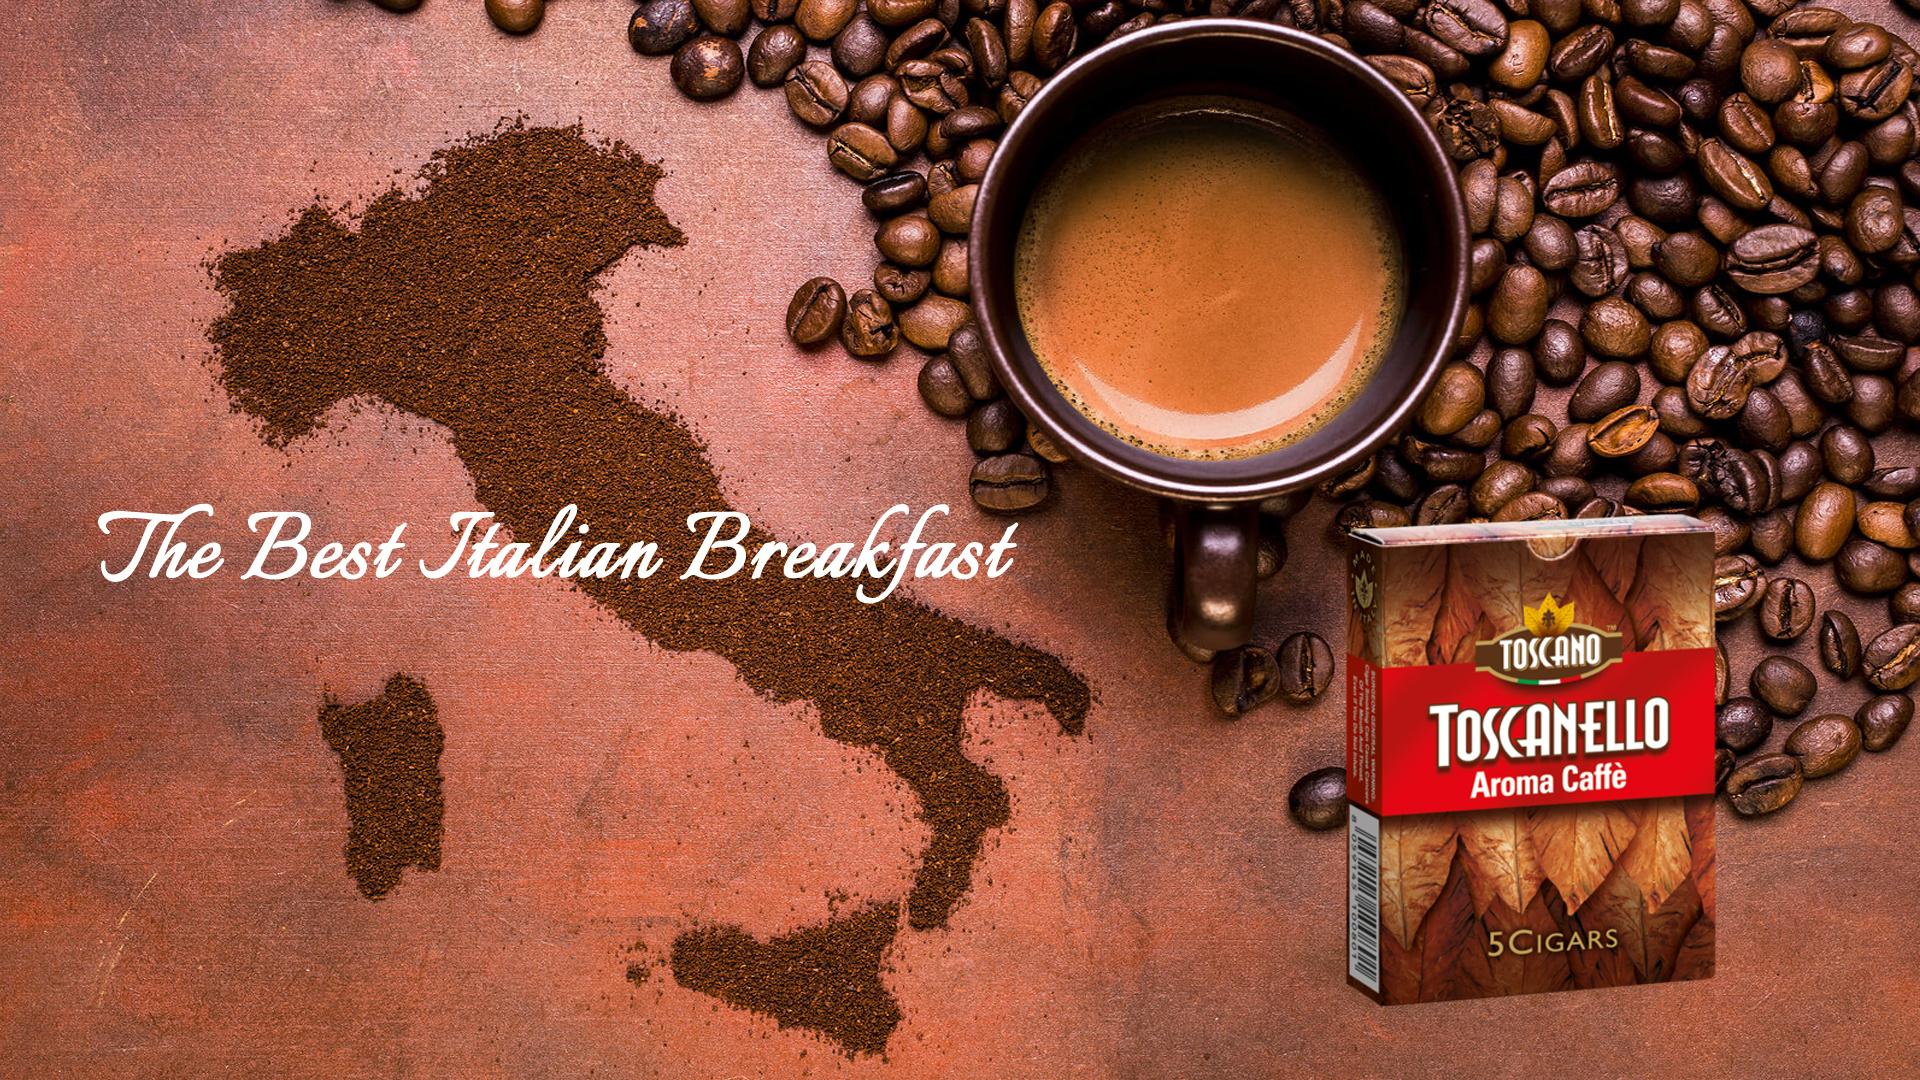 The Best Breakfast in The World!